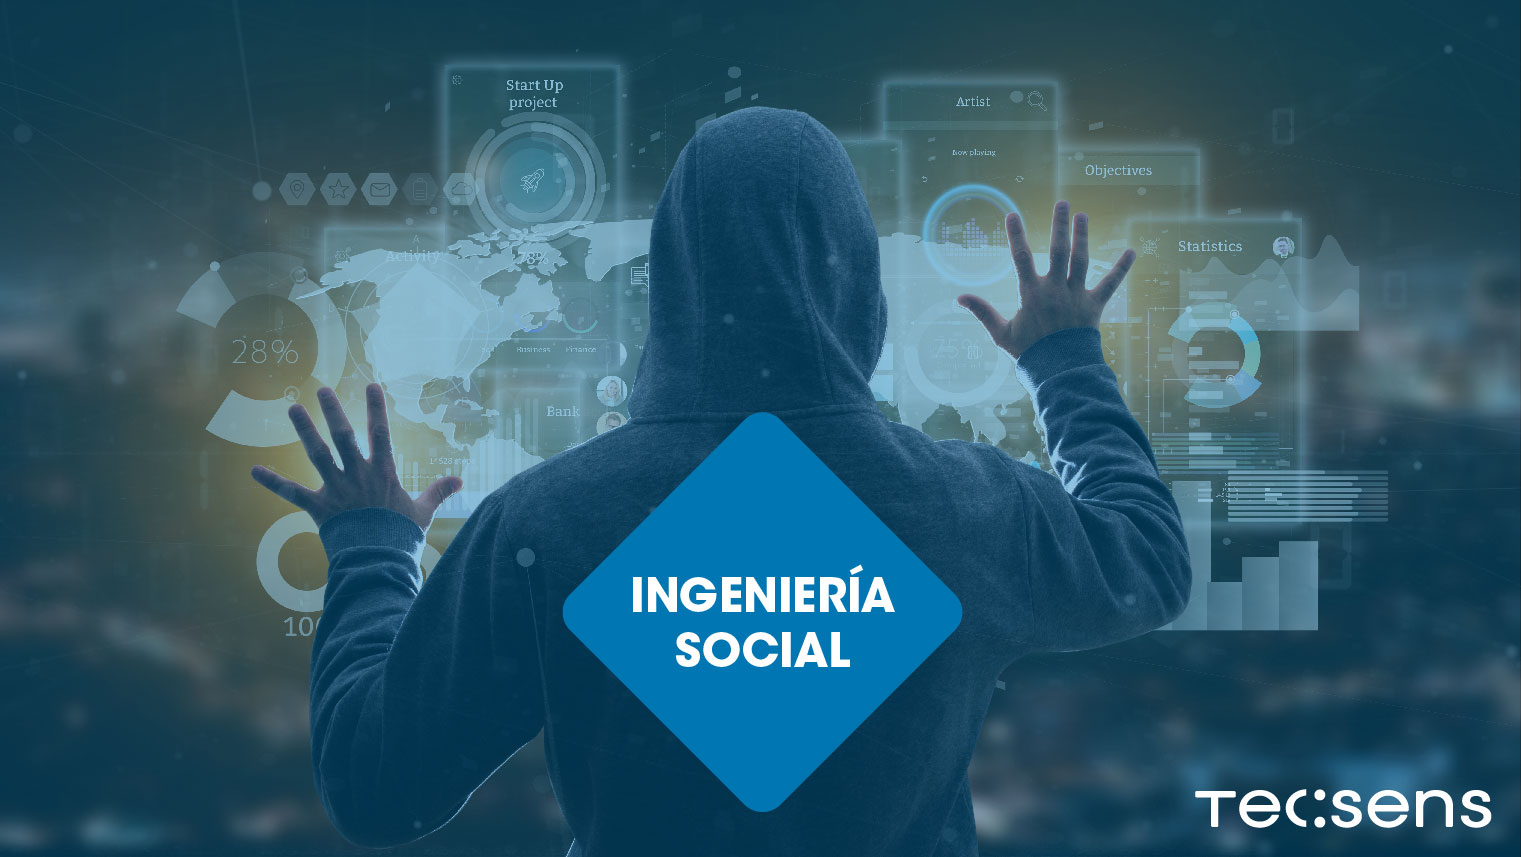 Enginyeria social